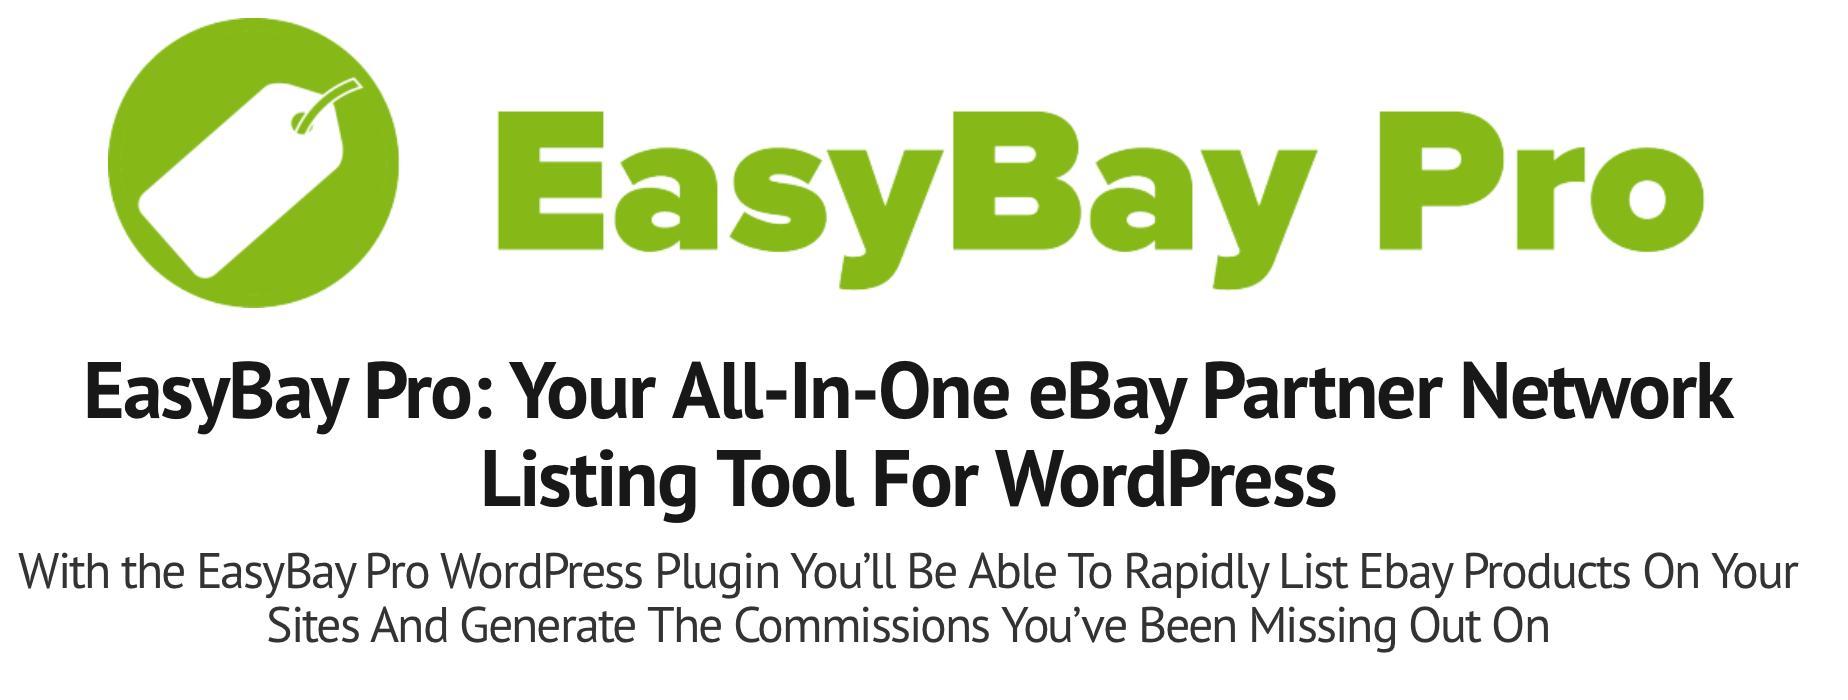 easybay pro